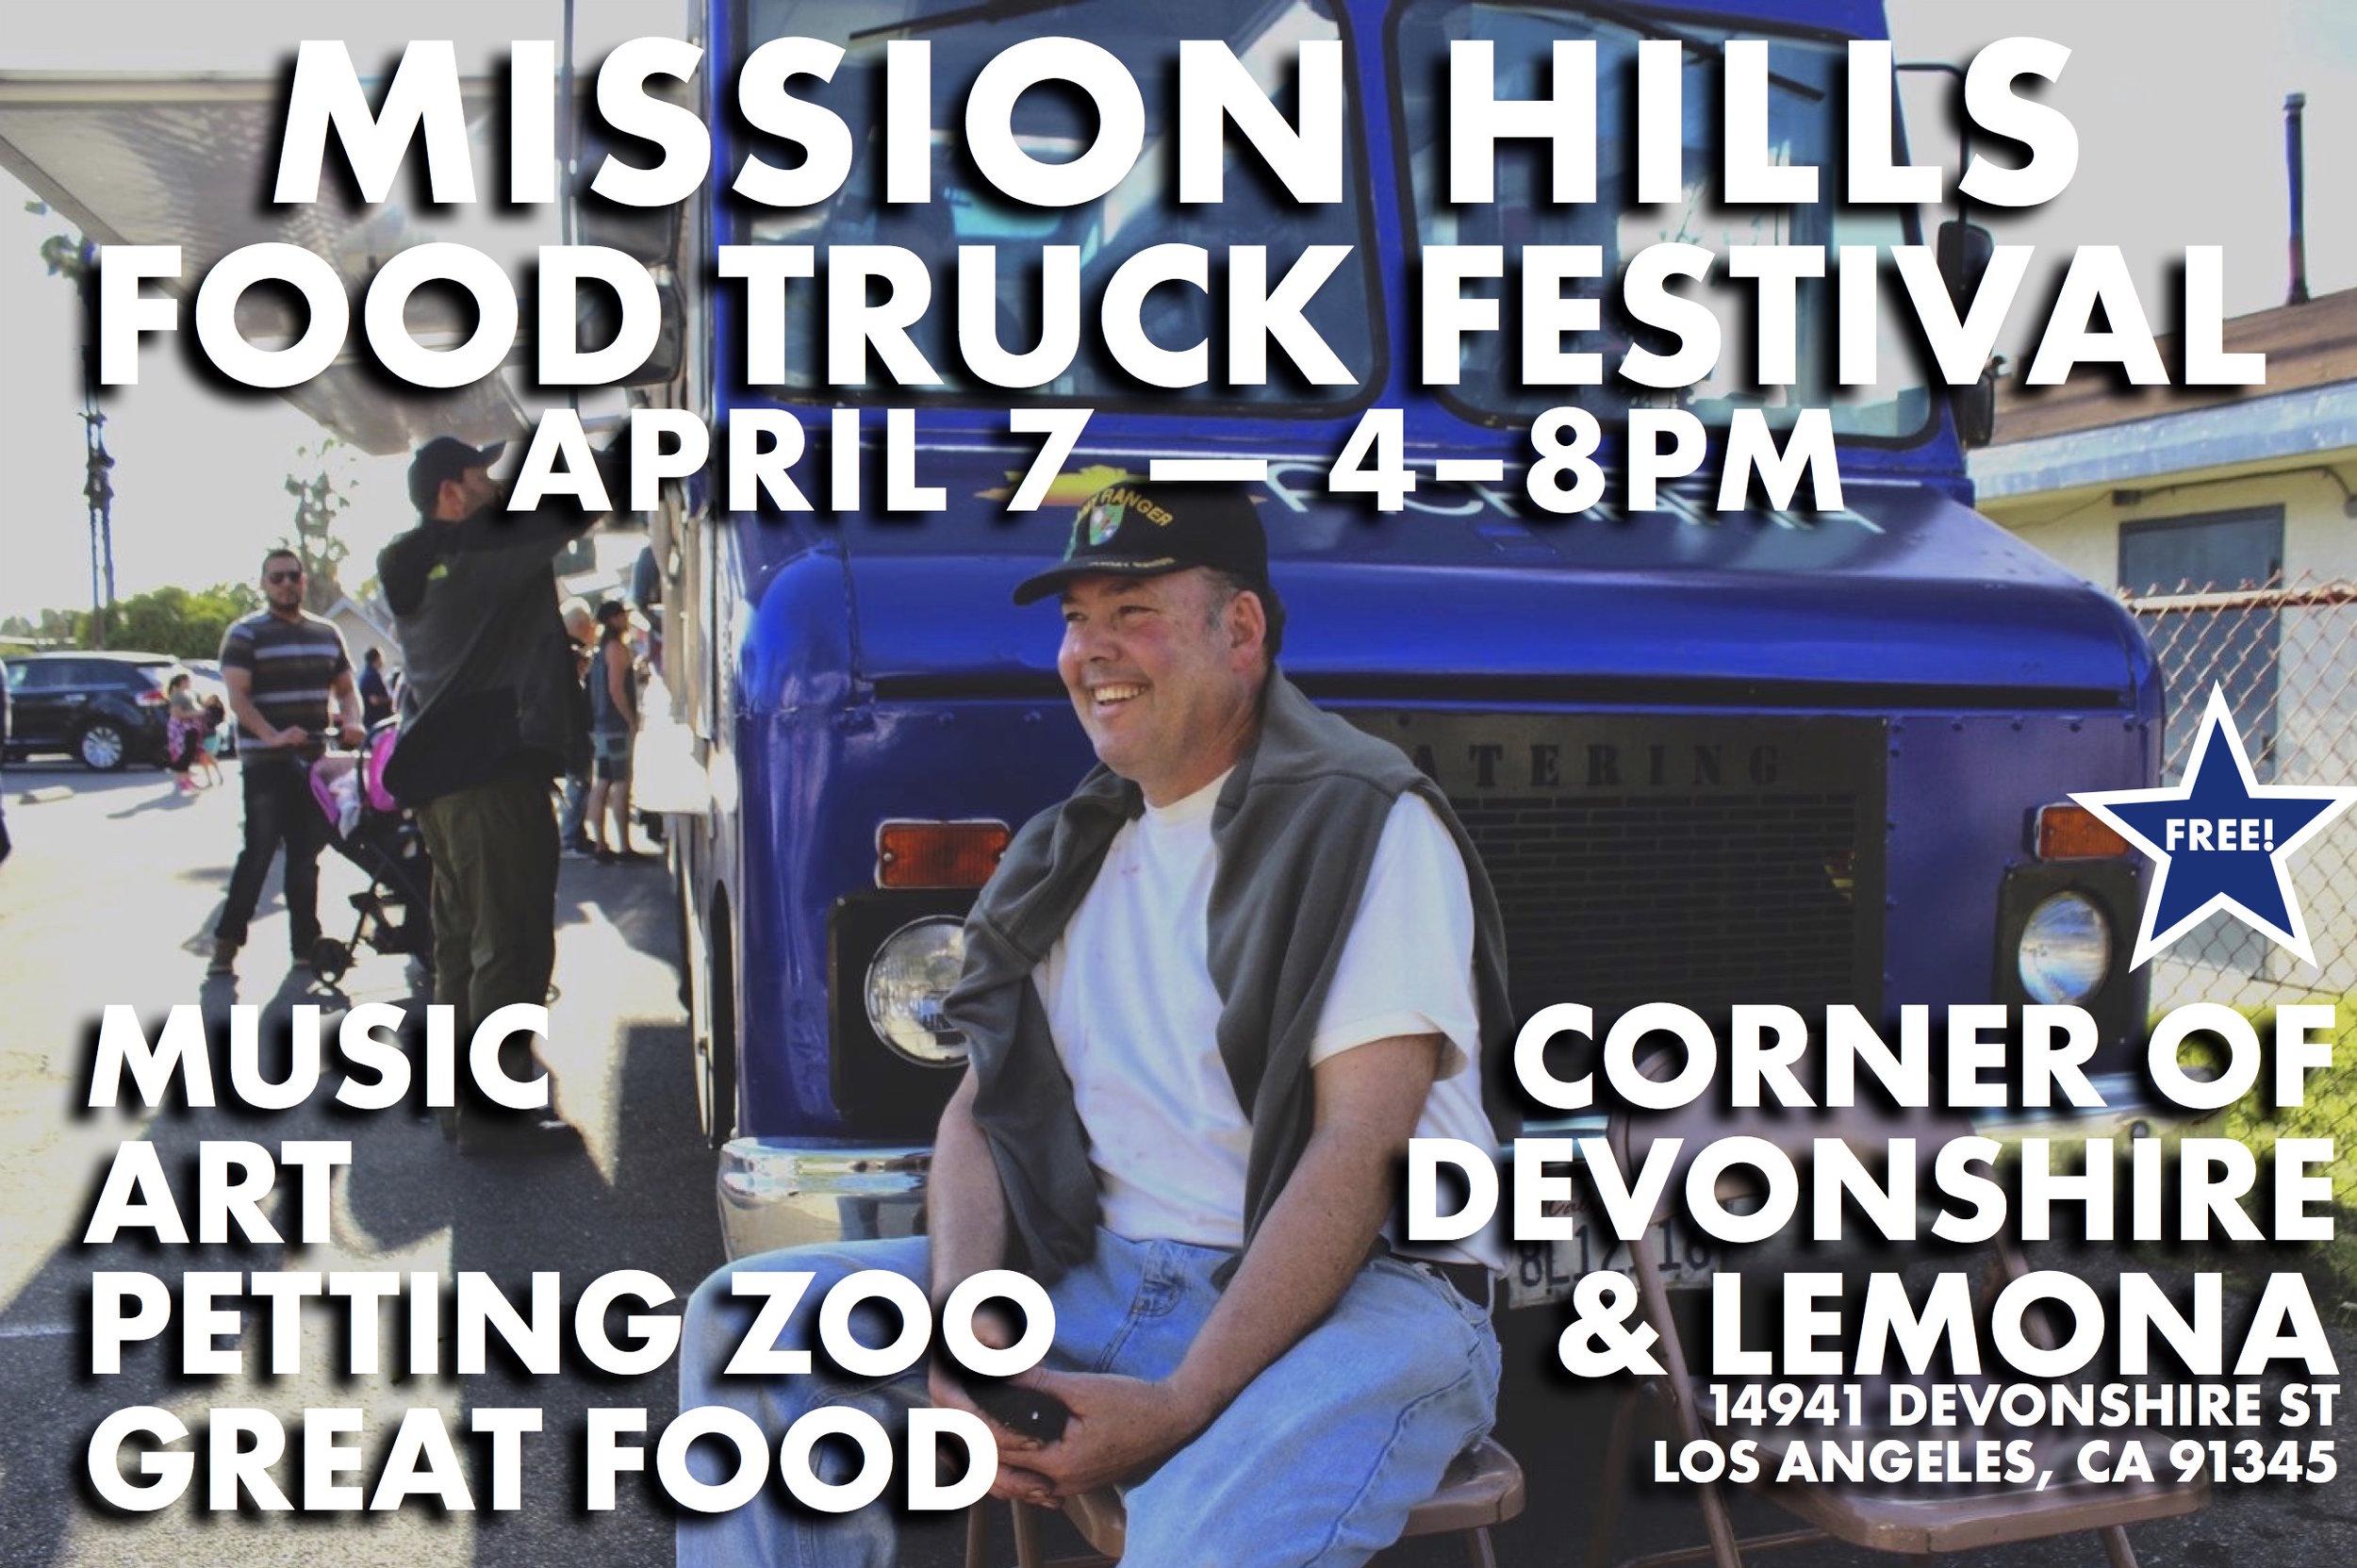 LOS-ANGELES-MISSION-HILLS-CHRISTIAN-CHURCH-FOOD-TRUCK-FESTIVAL-2018.jpg